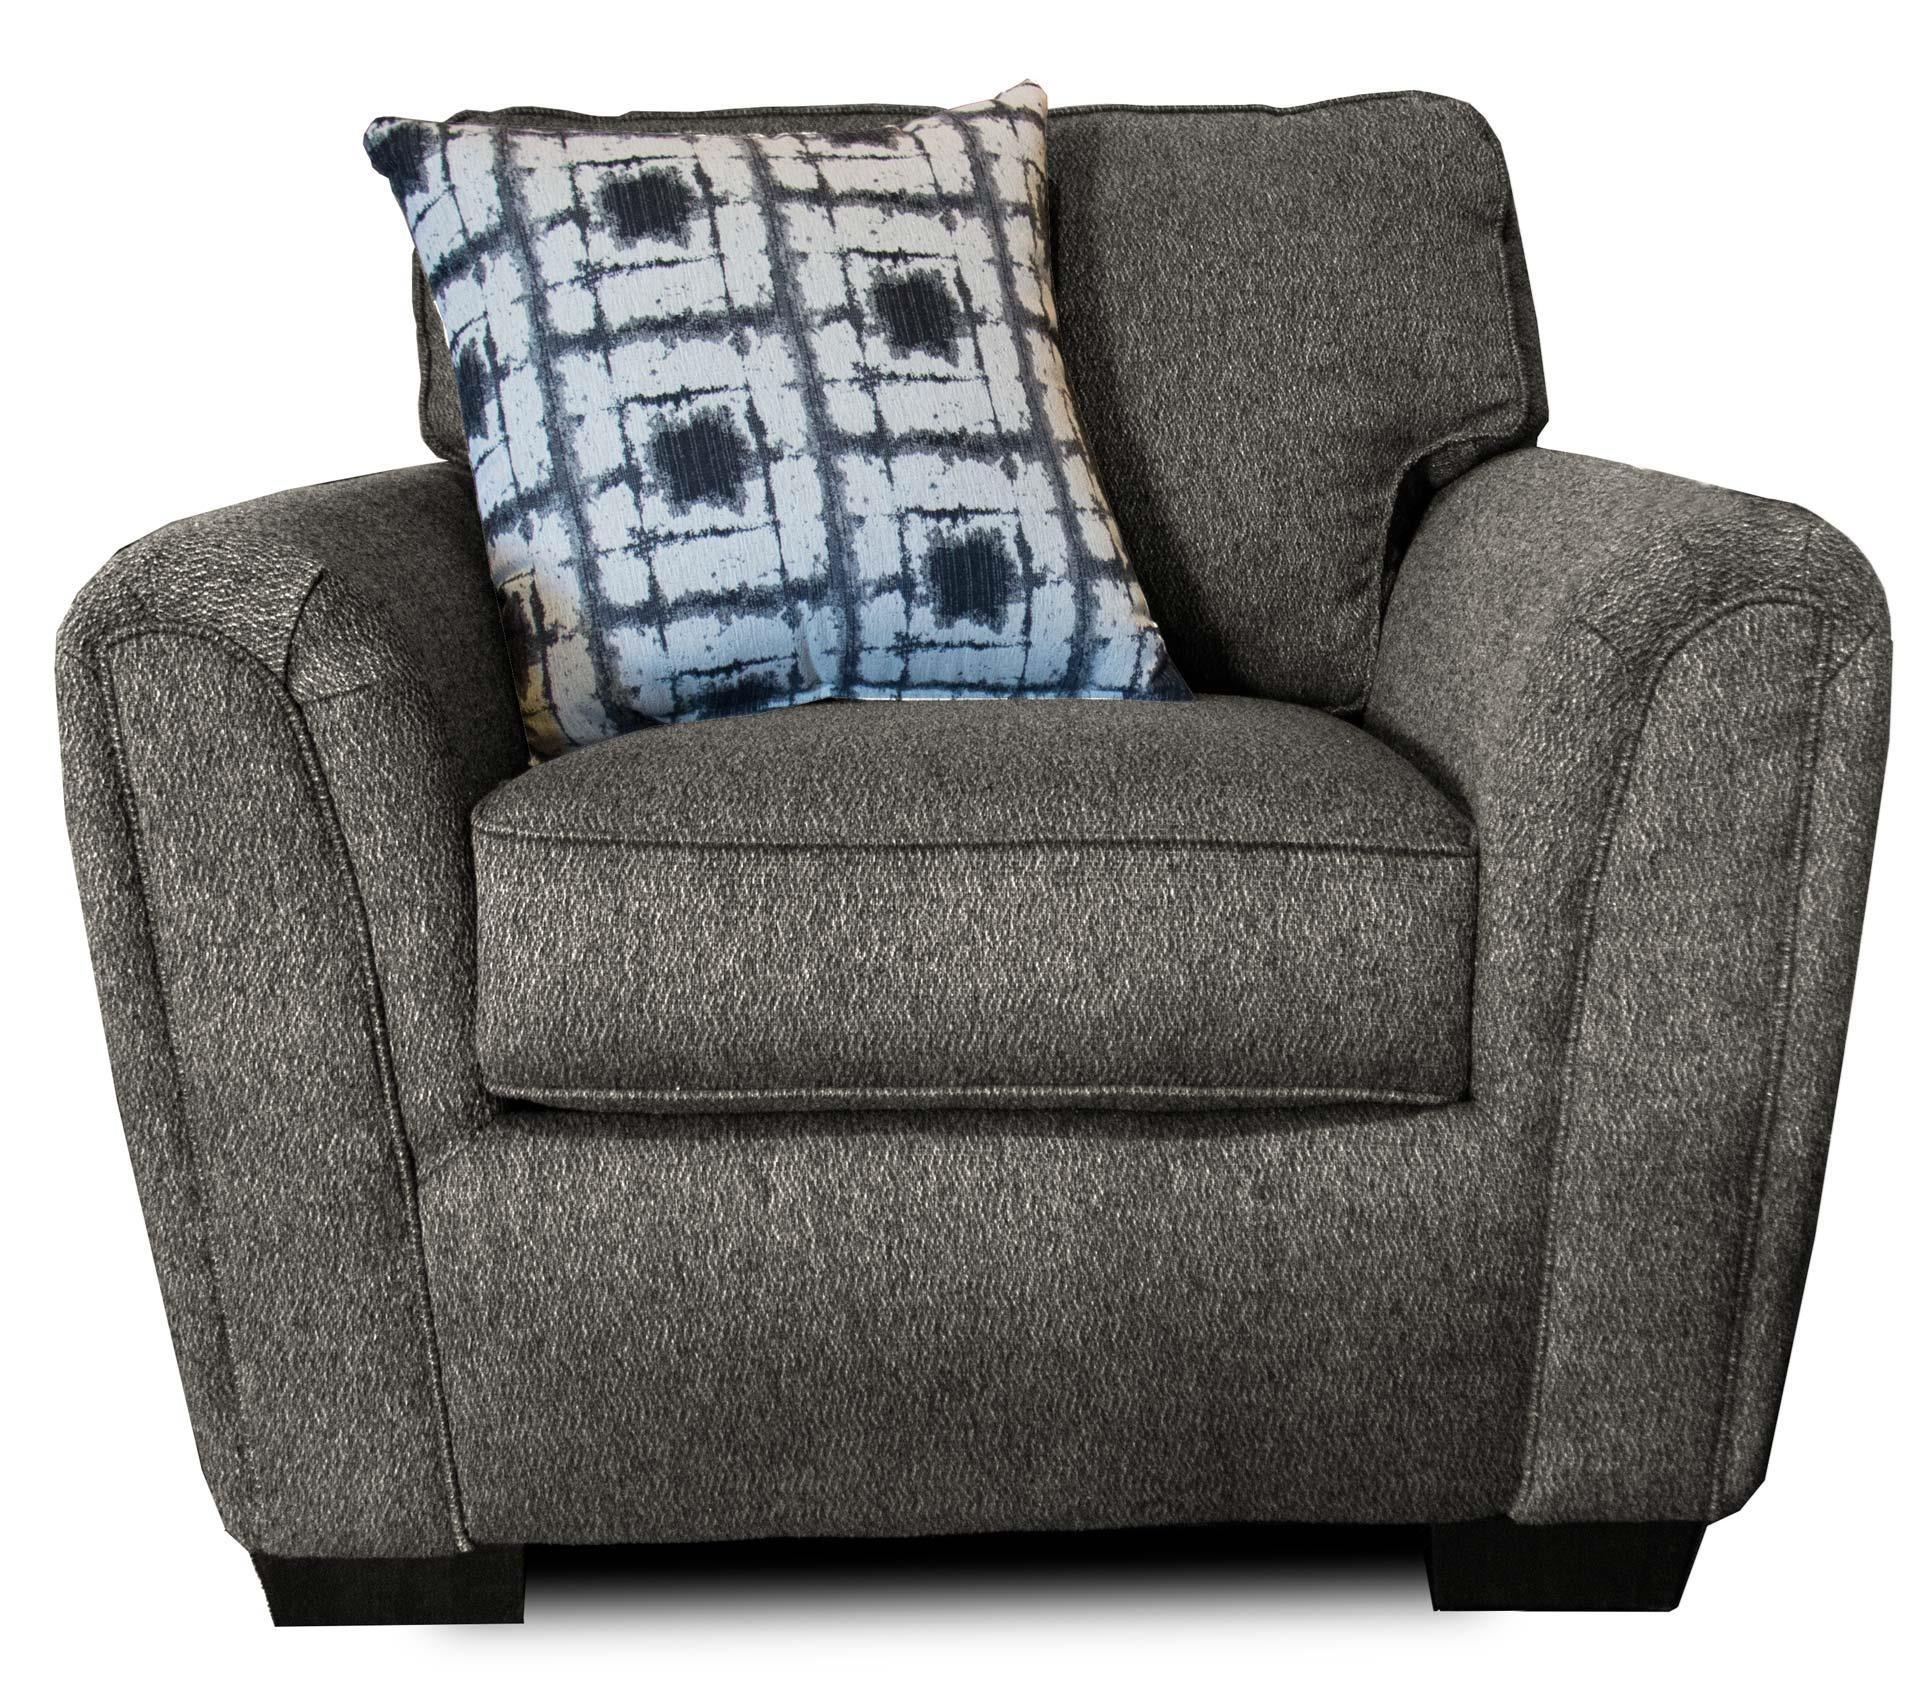 Corinthian Rapids Chair - Item Number: 7371